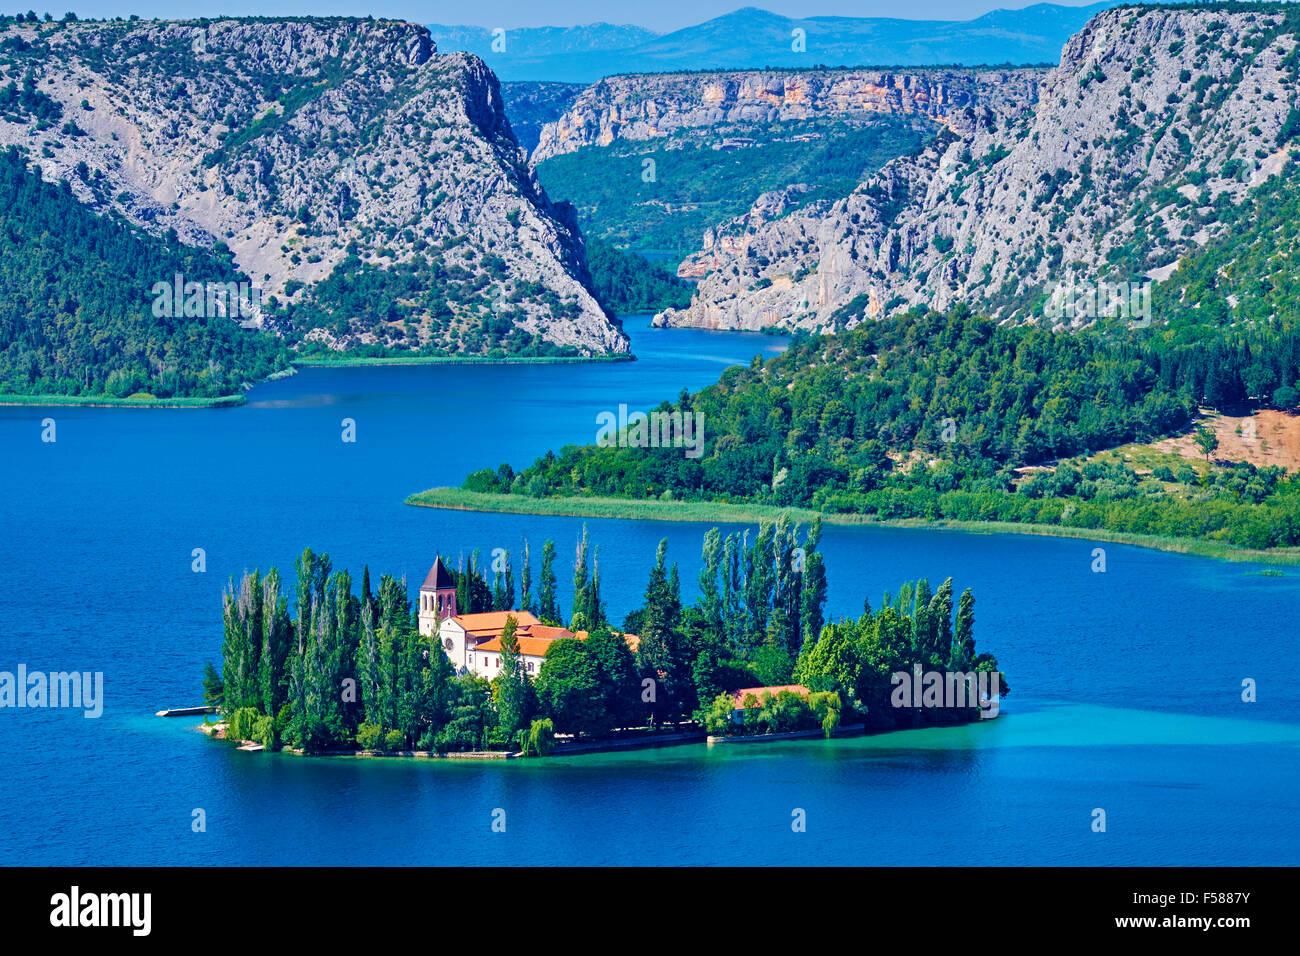 Kroatien, Dalmatien, Sibenik-Knin, Krka Nationalpark, römisch-katholische Franziskaner Kloster Visovac Stockbild